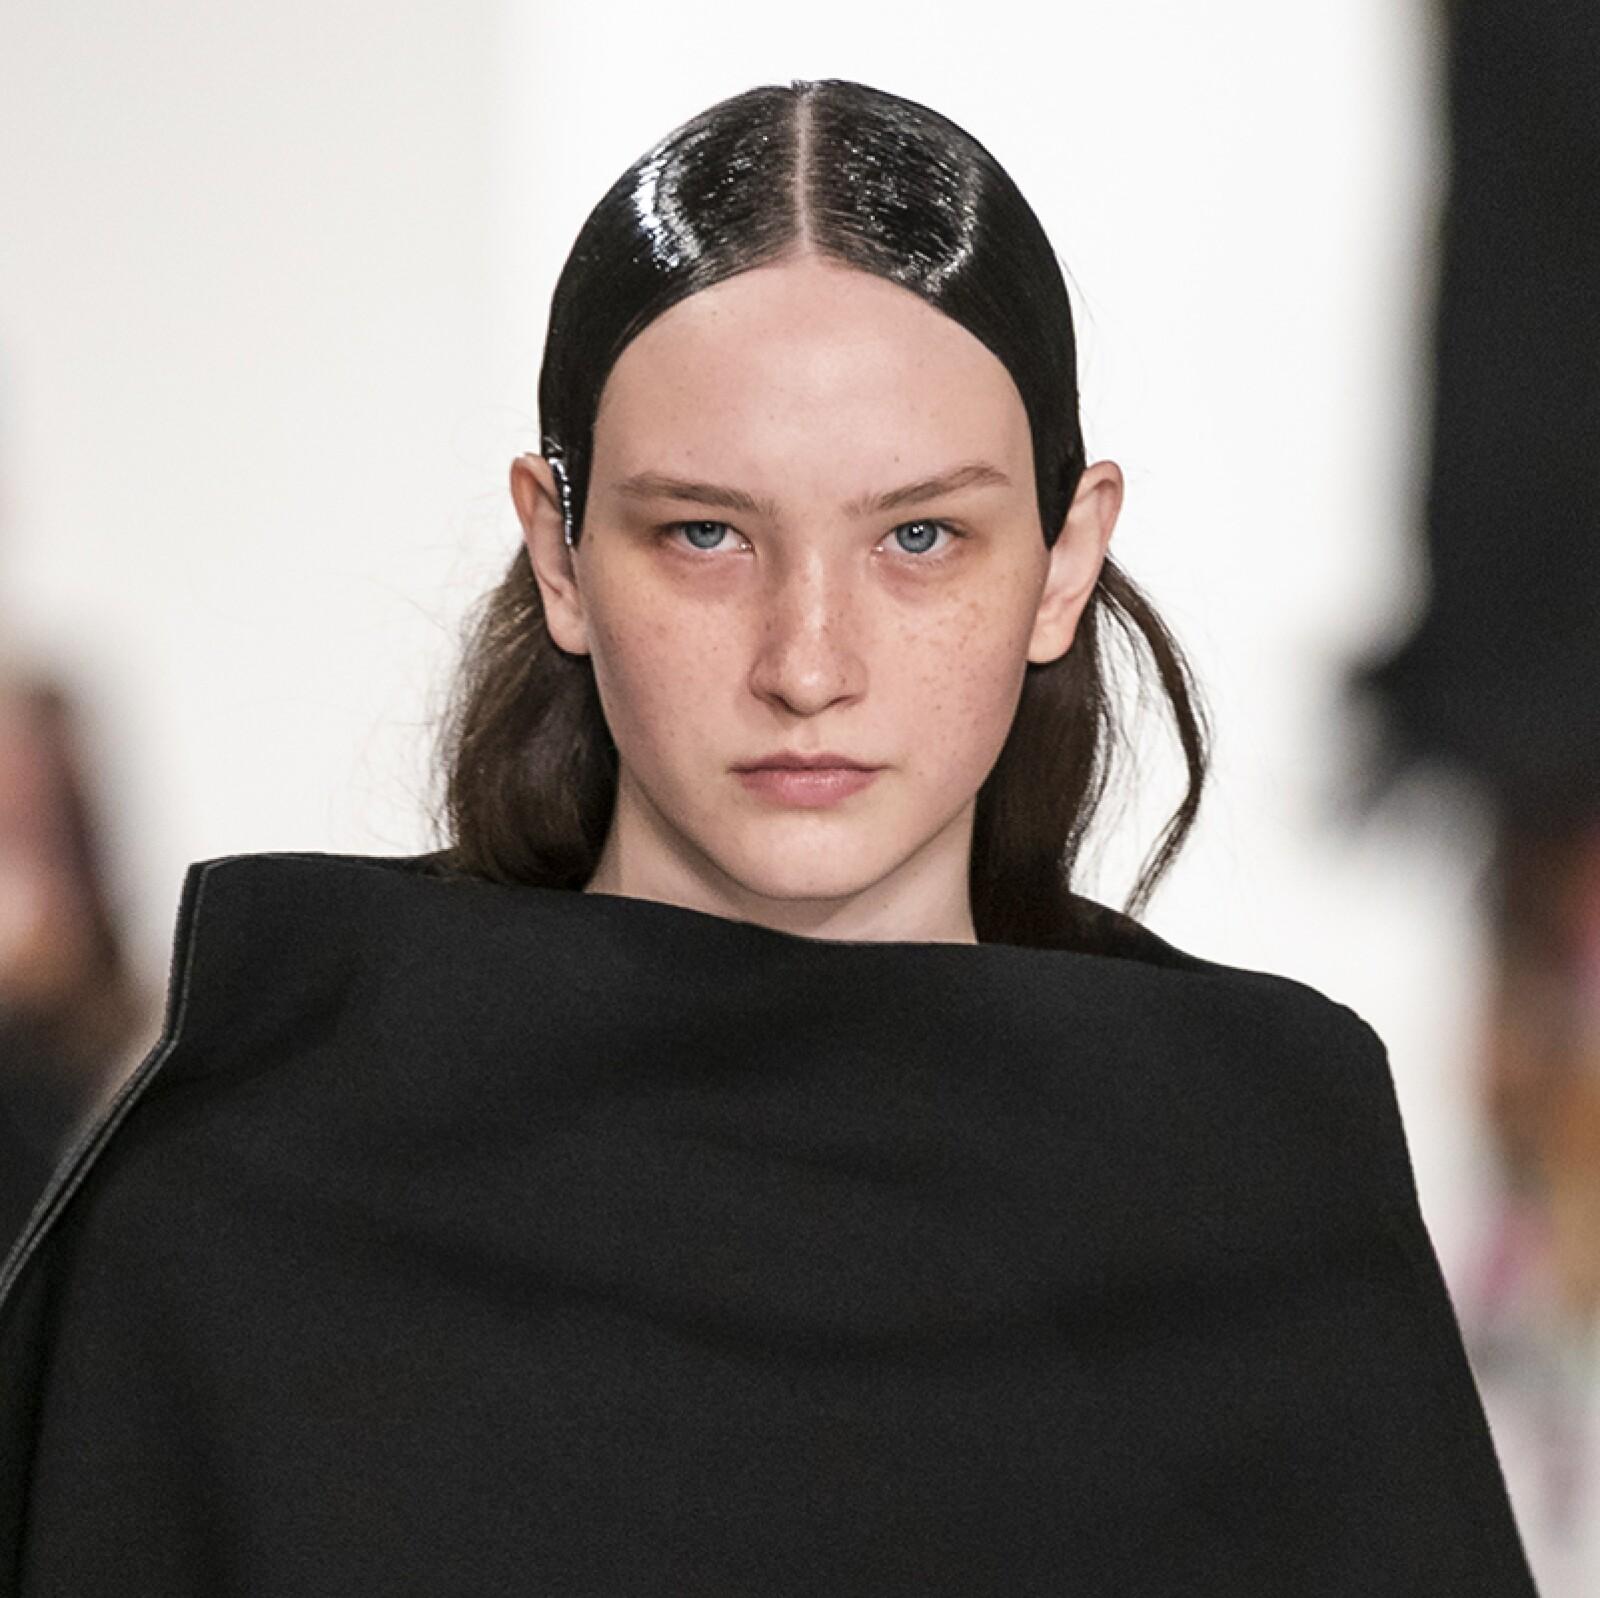 PFW-Paris-Fashion-Week-Runway-Pasarela-Beauty-Look-Belleza-Maison-Margiela